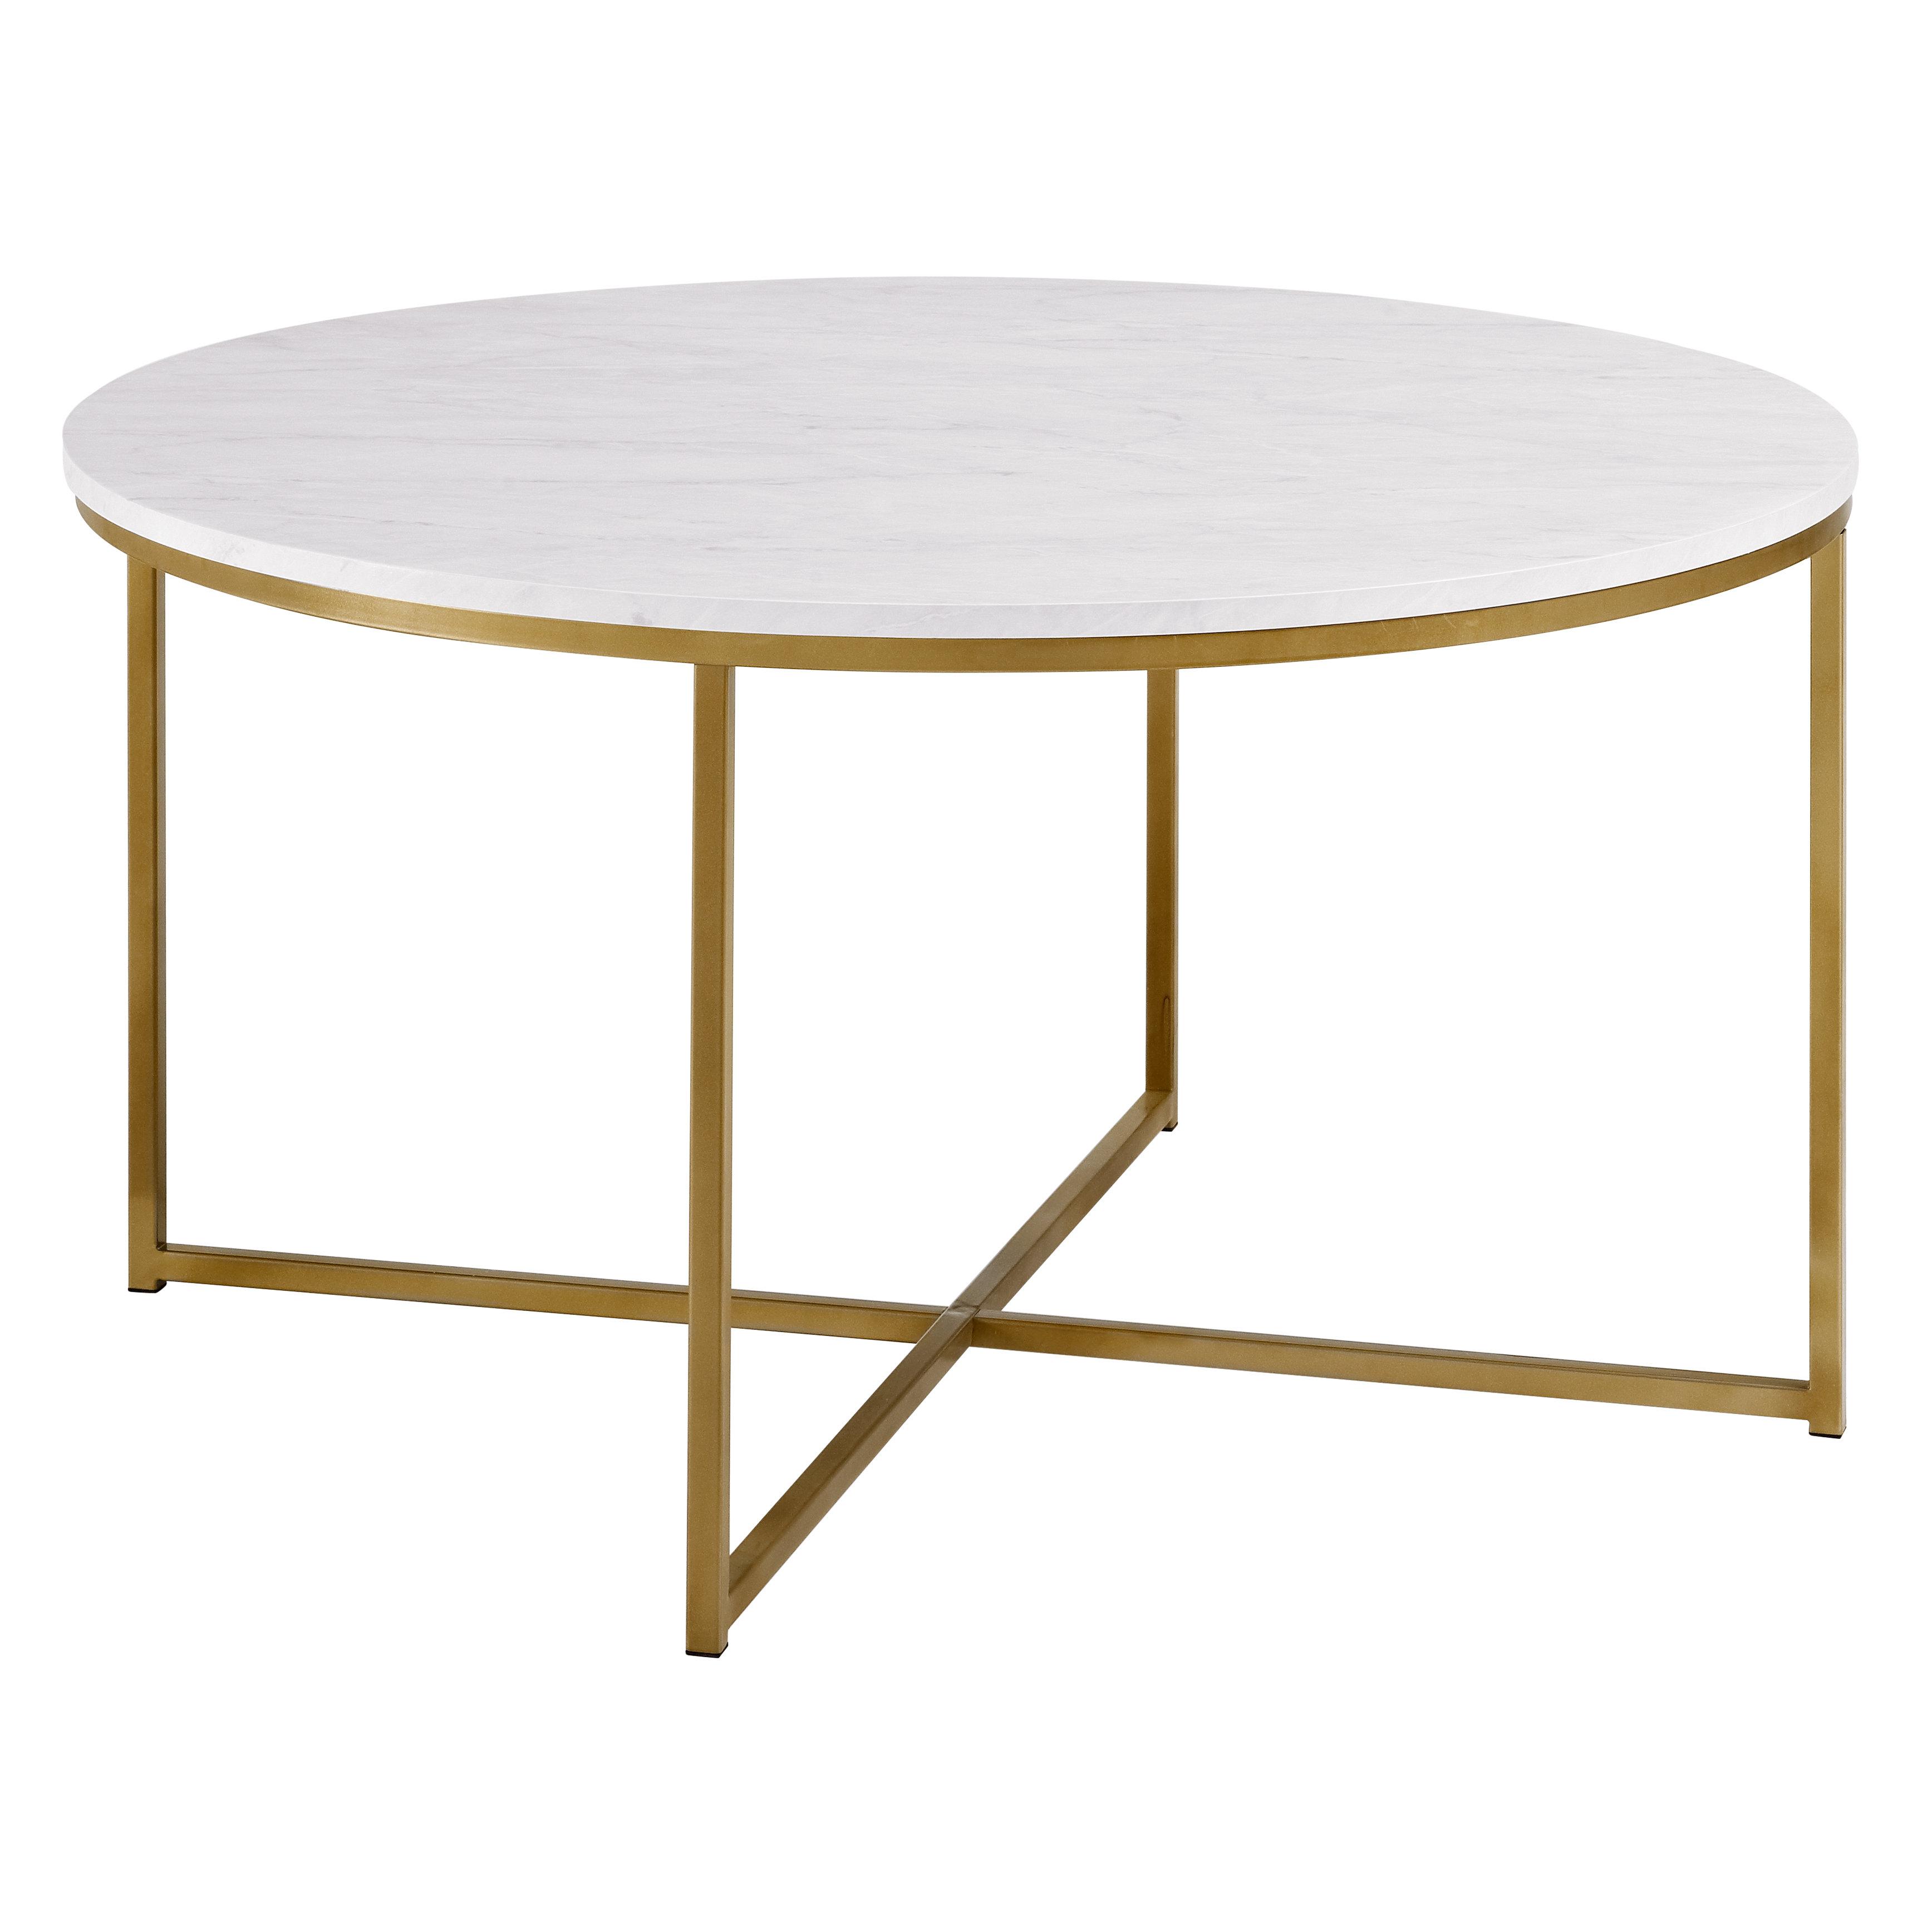 Zipcode Design Levinson Coffee Table Reviews Wayfaircouk regarding measurements 3471 X 3471